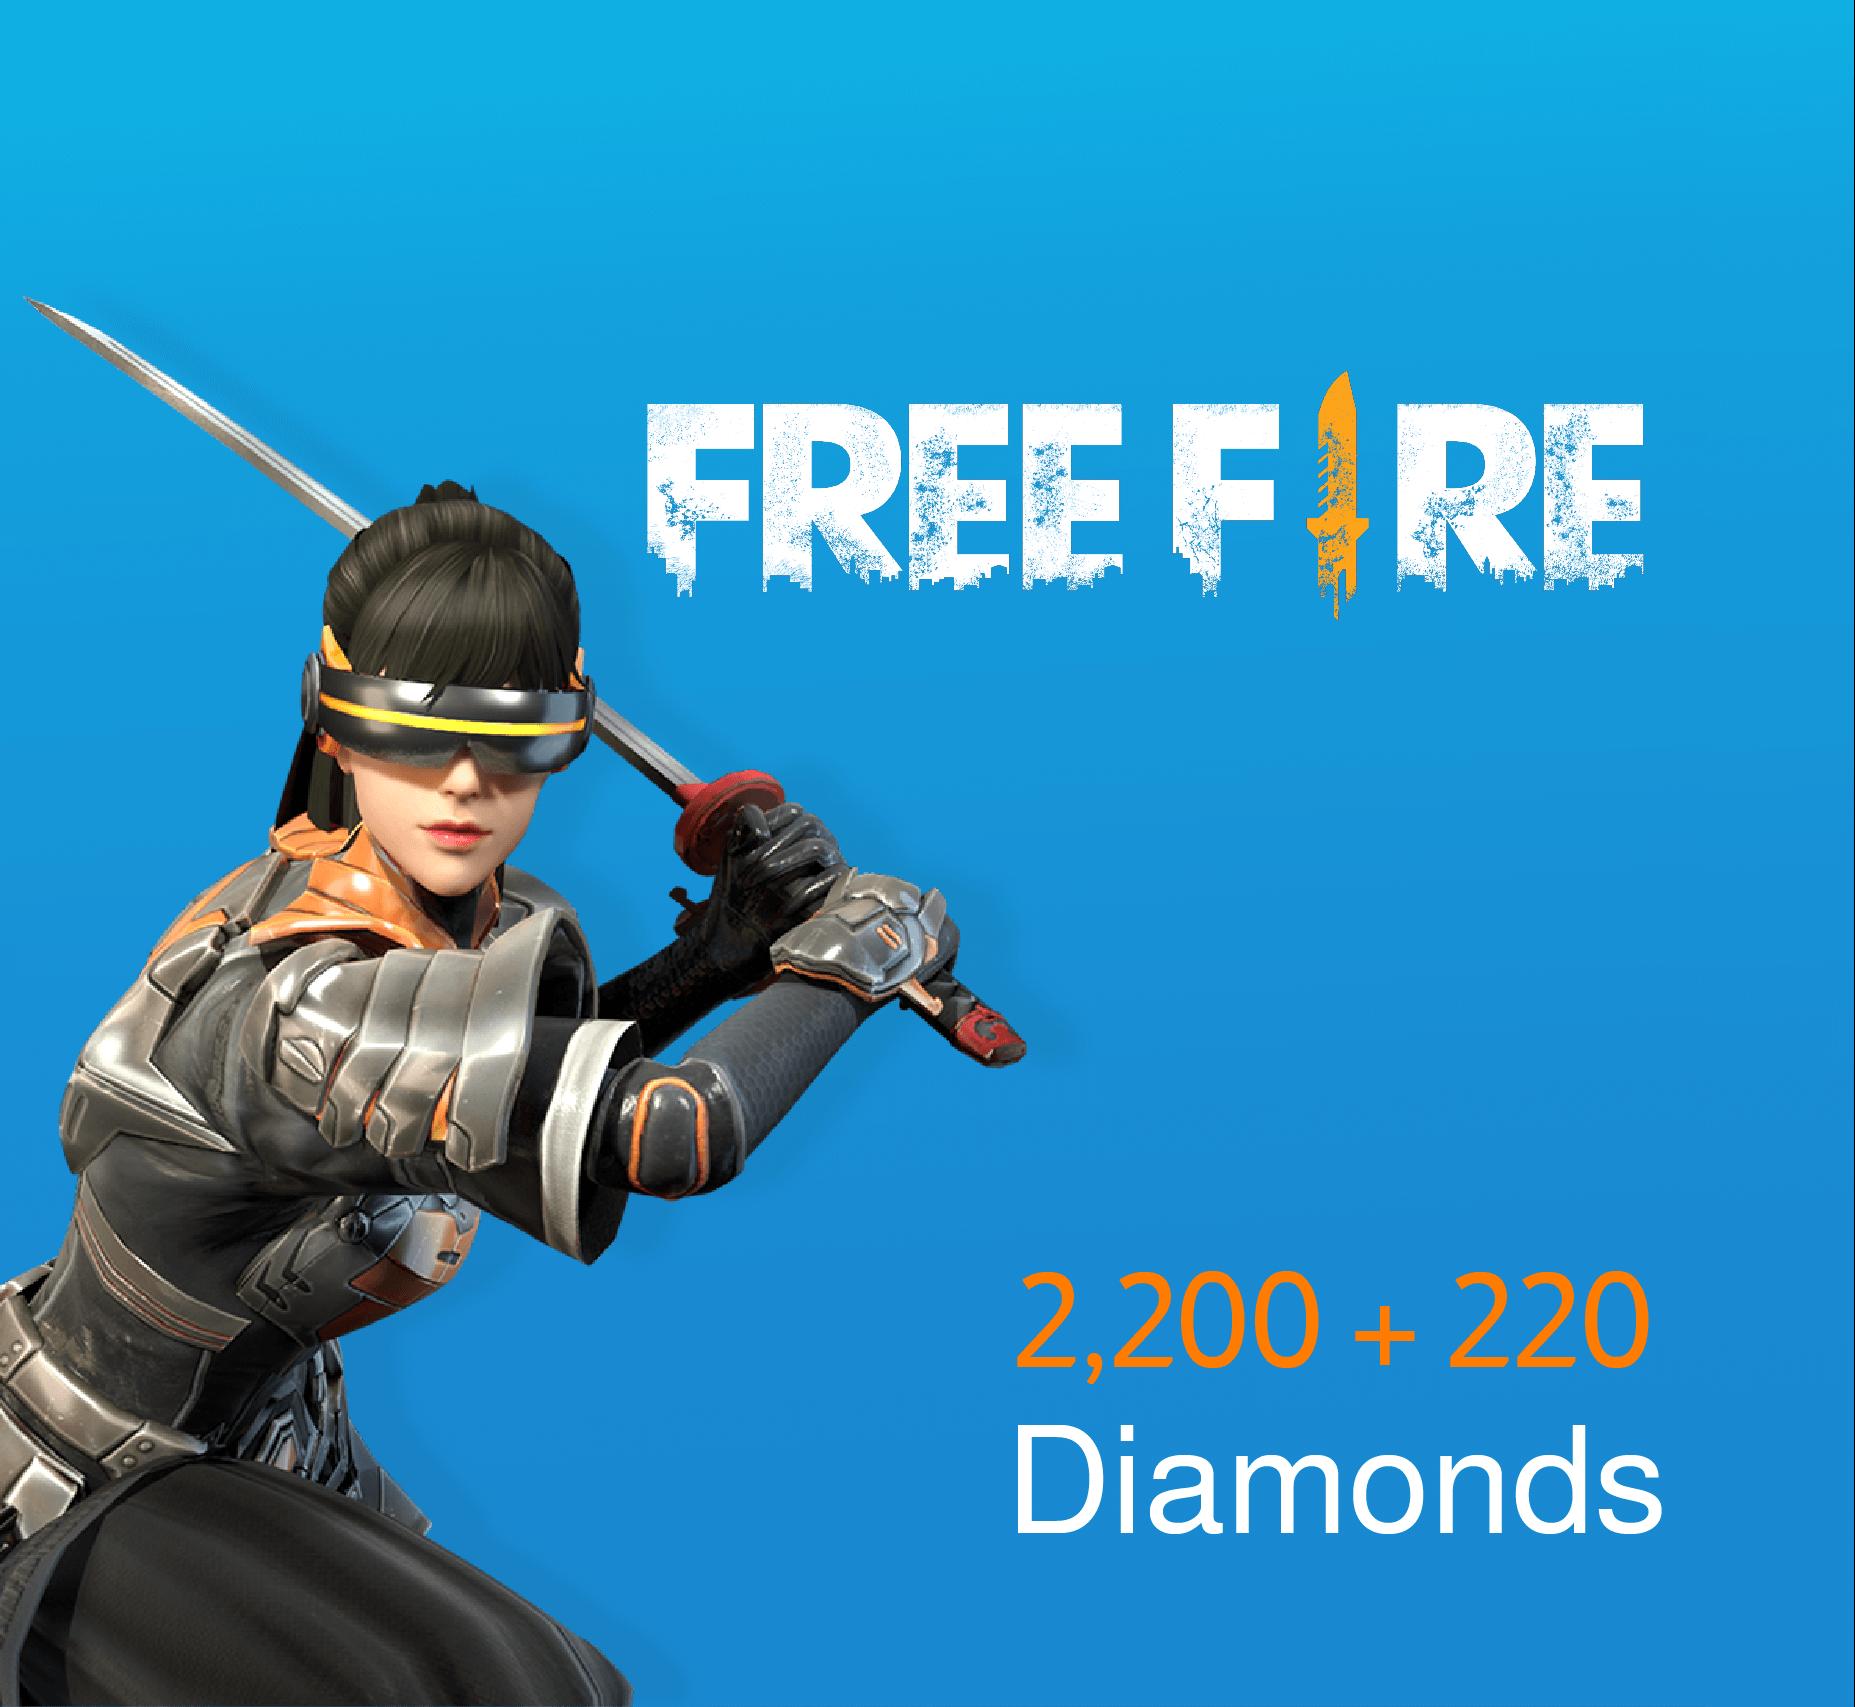 Free fire Pins 2200 + 220 Diamonds